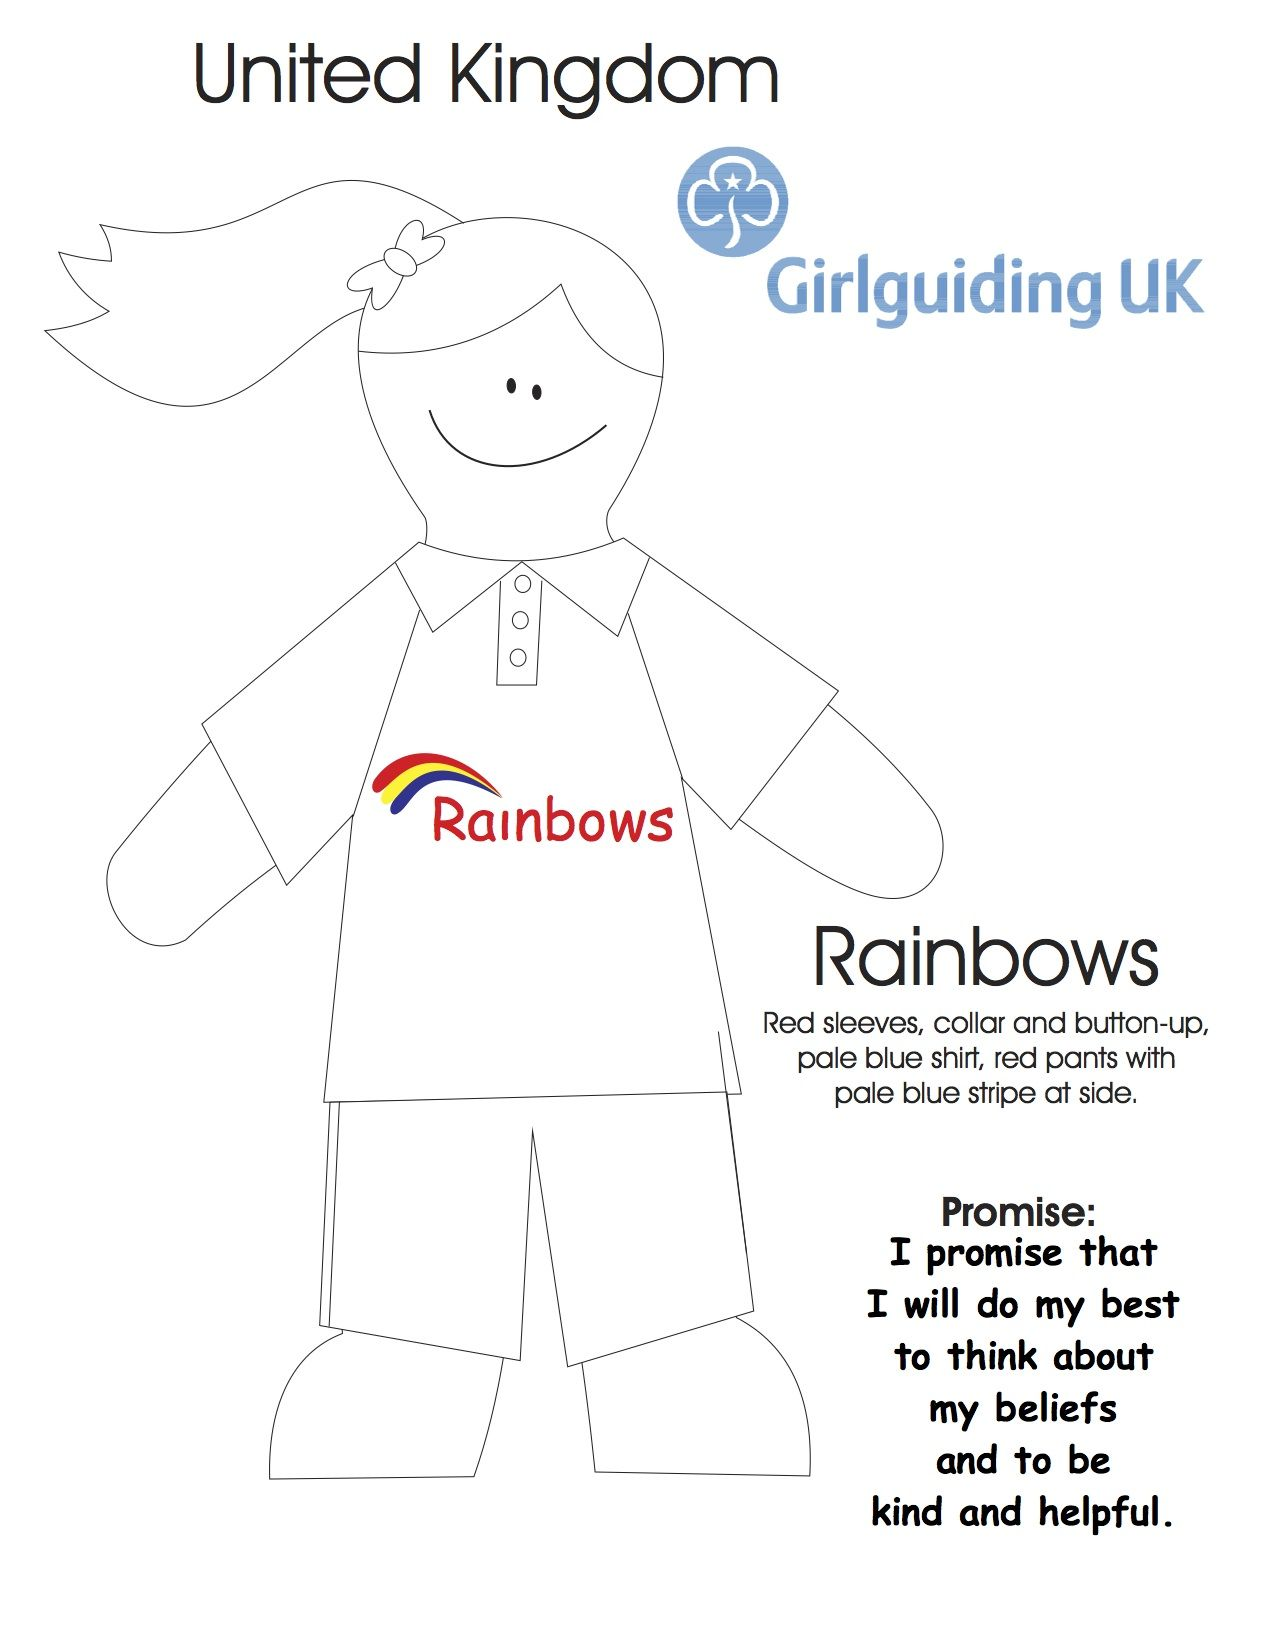 United Kingdom Rainbow Colouring Sheet